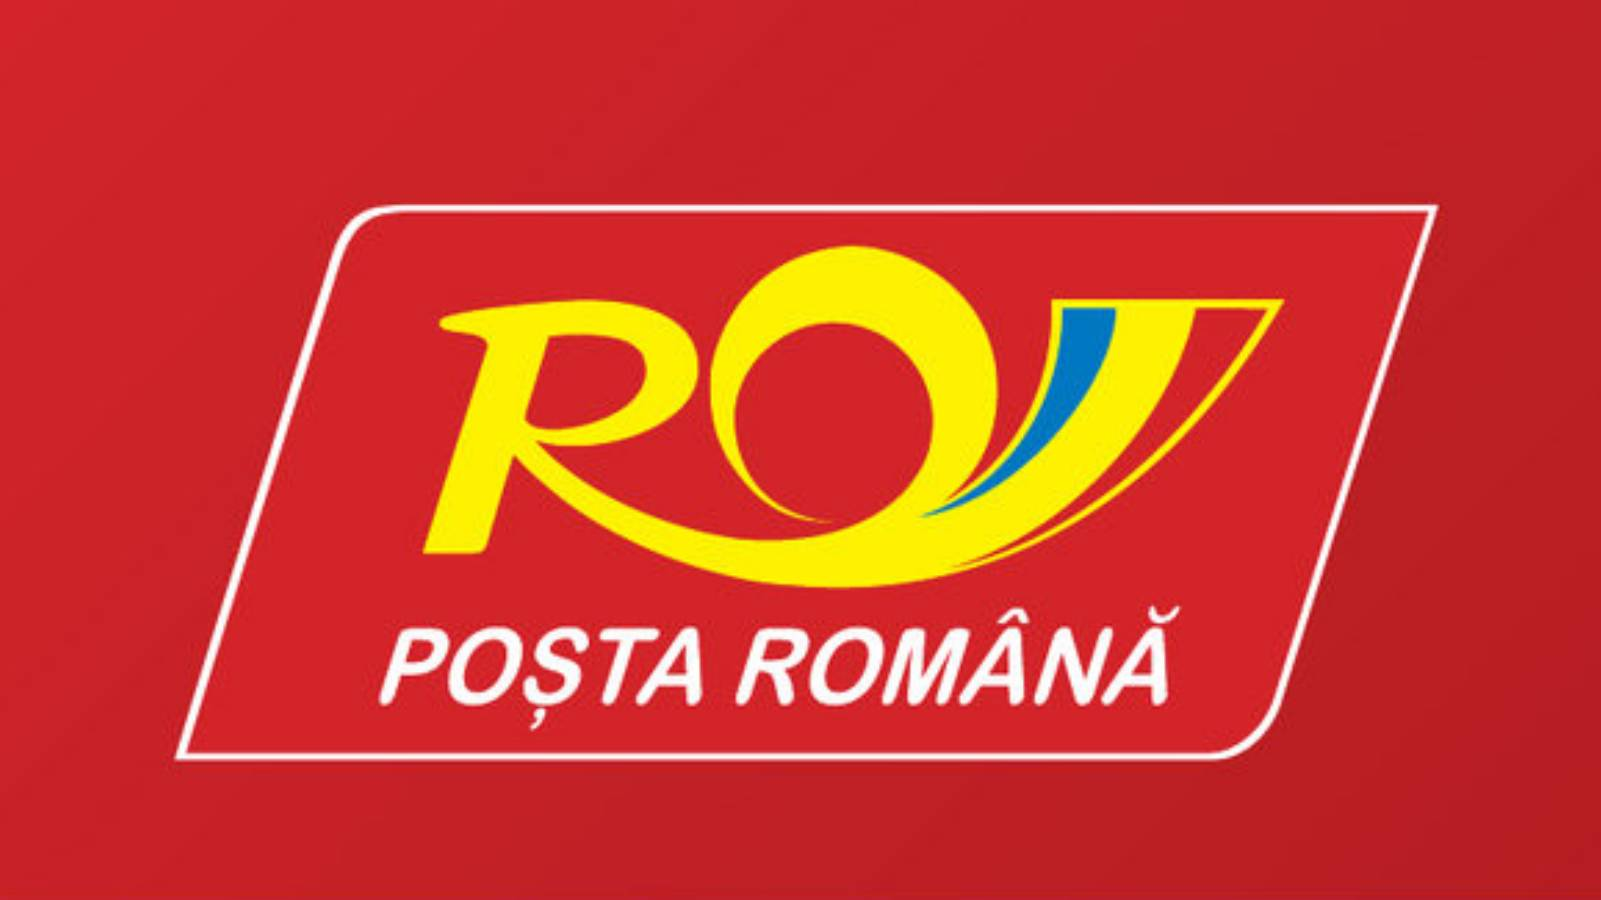 Posta Romana inchiriere casuta postala